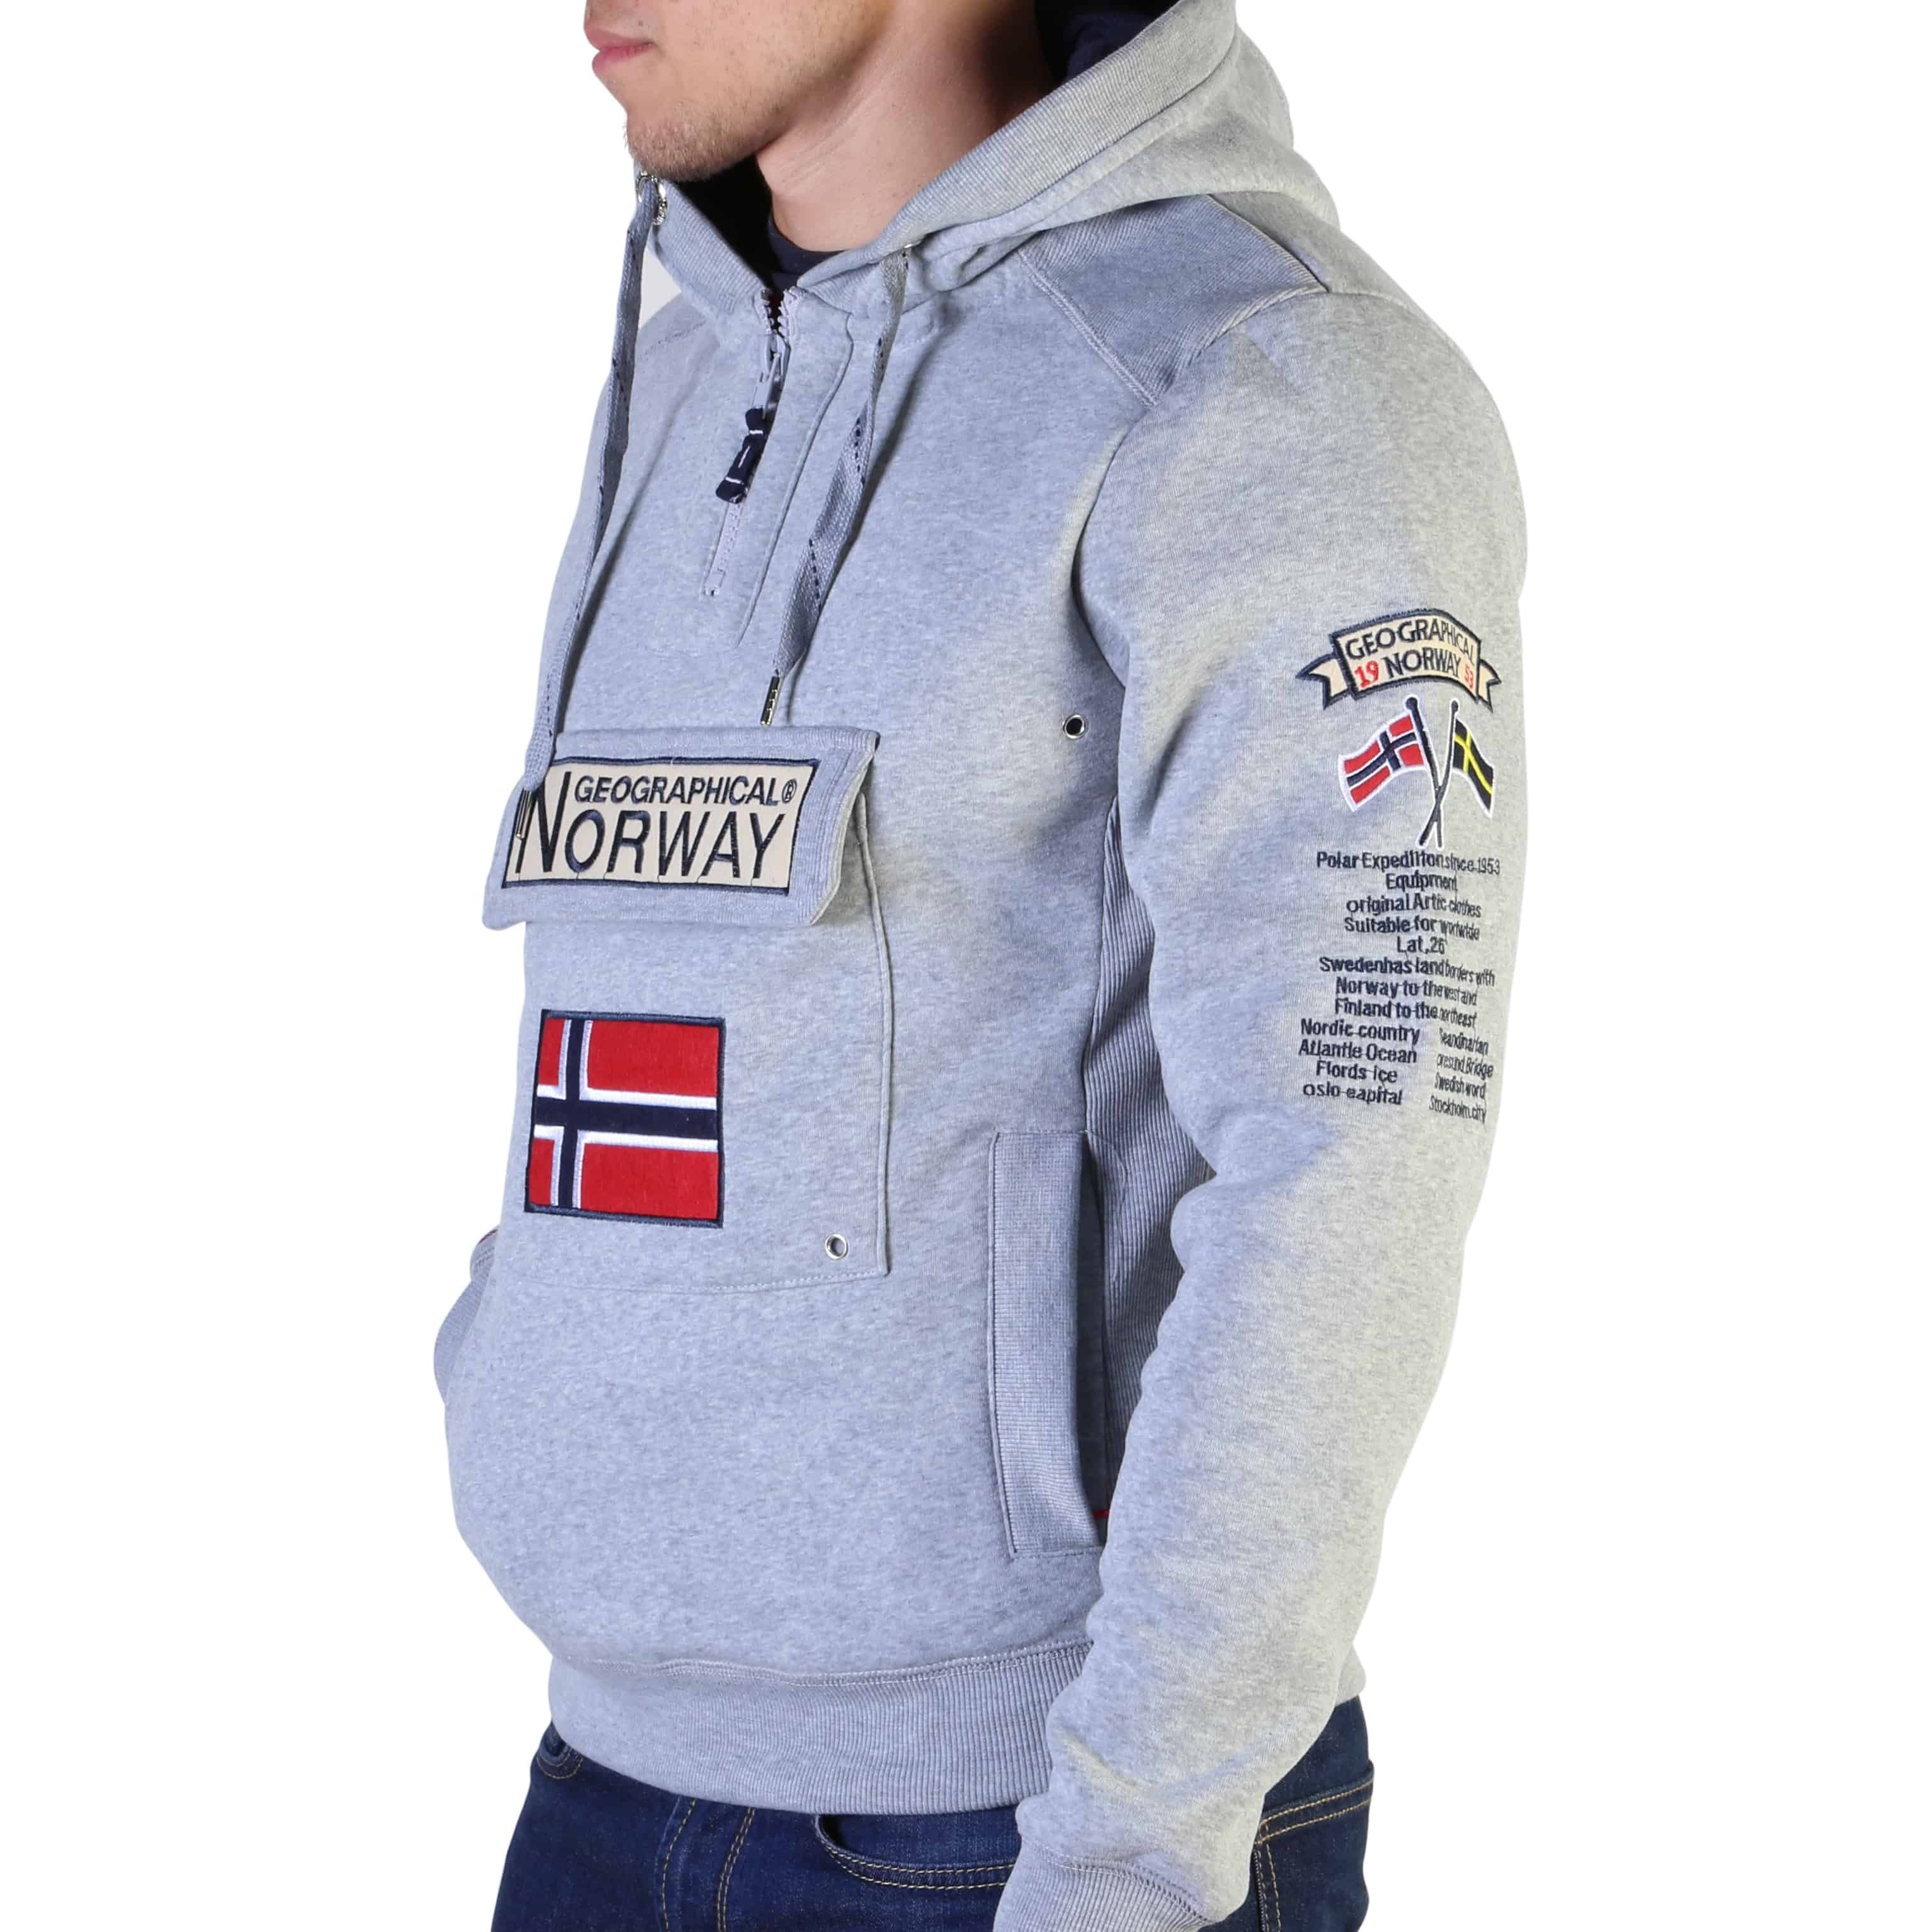 Sweat-shirts Geographical Norway – Gymclass007_man